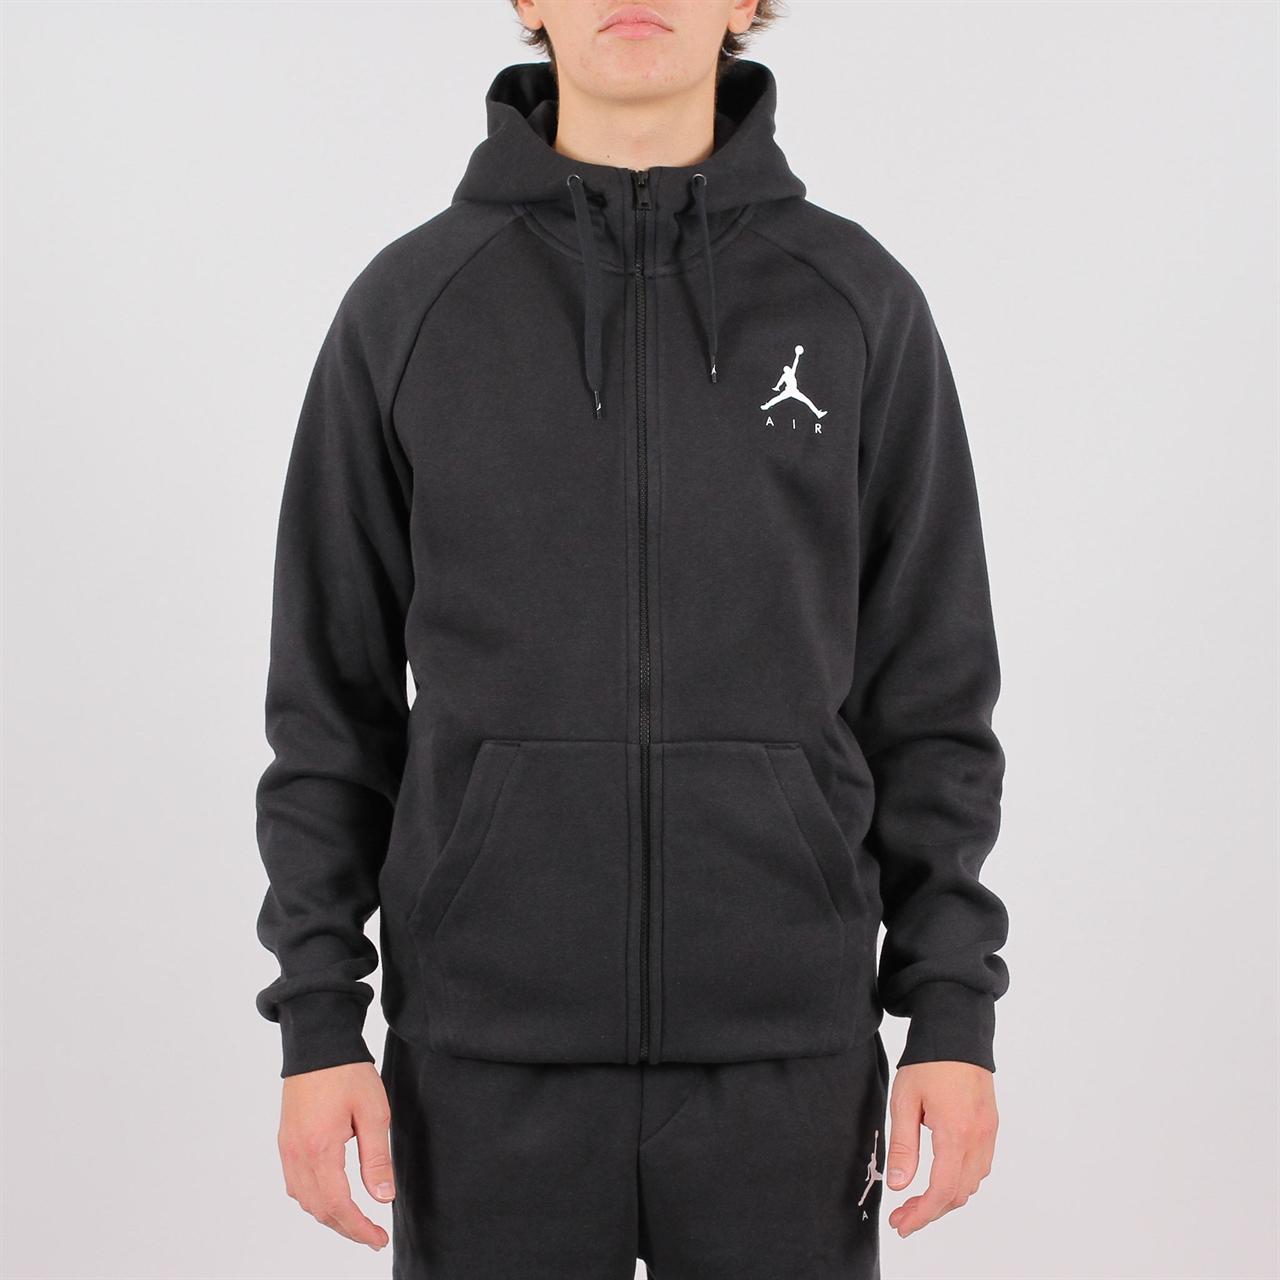 17bbaa1701da Shelta - Jordan Jumpman Air Fleece Full-Zip Hoodie Black (939998 ...